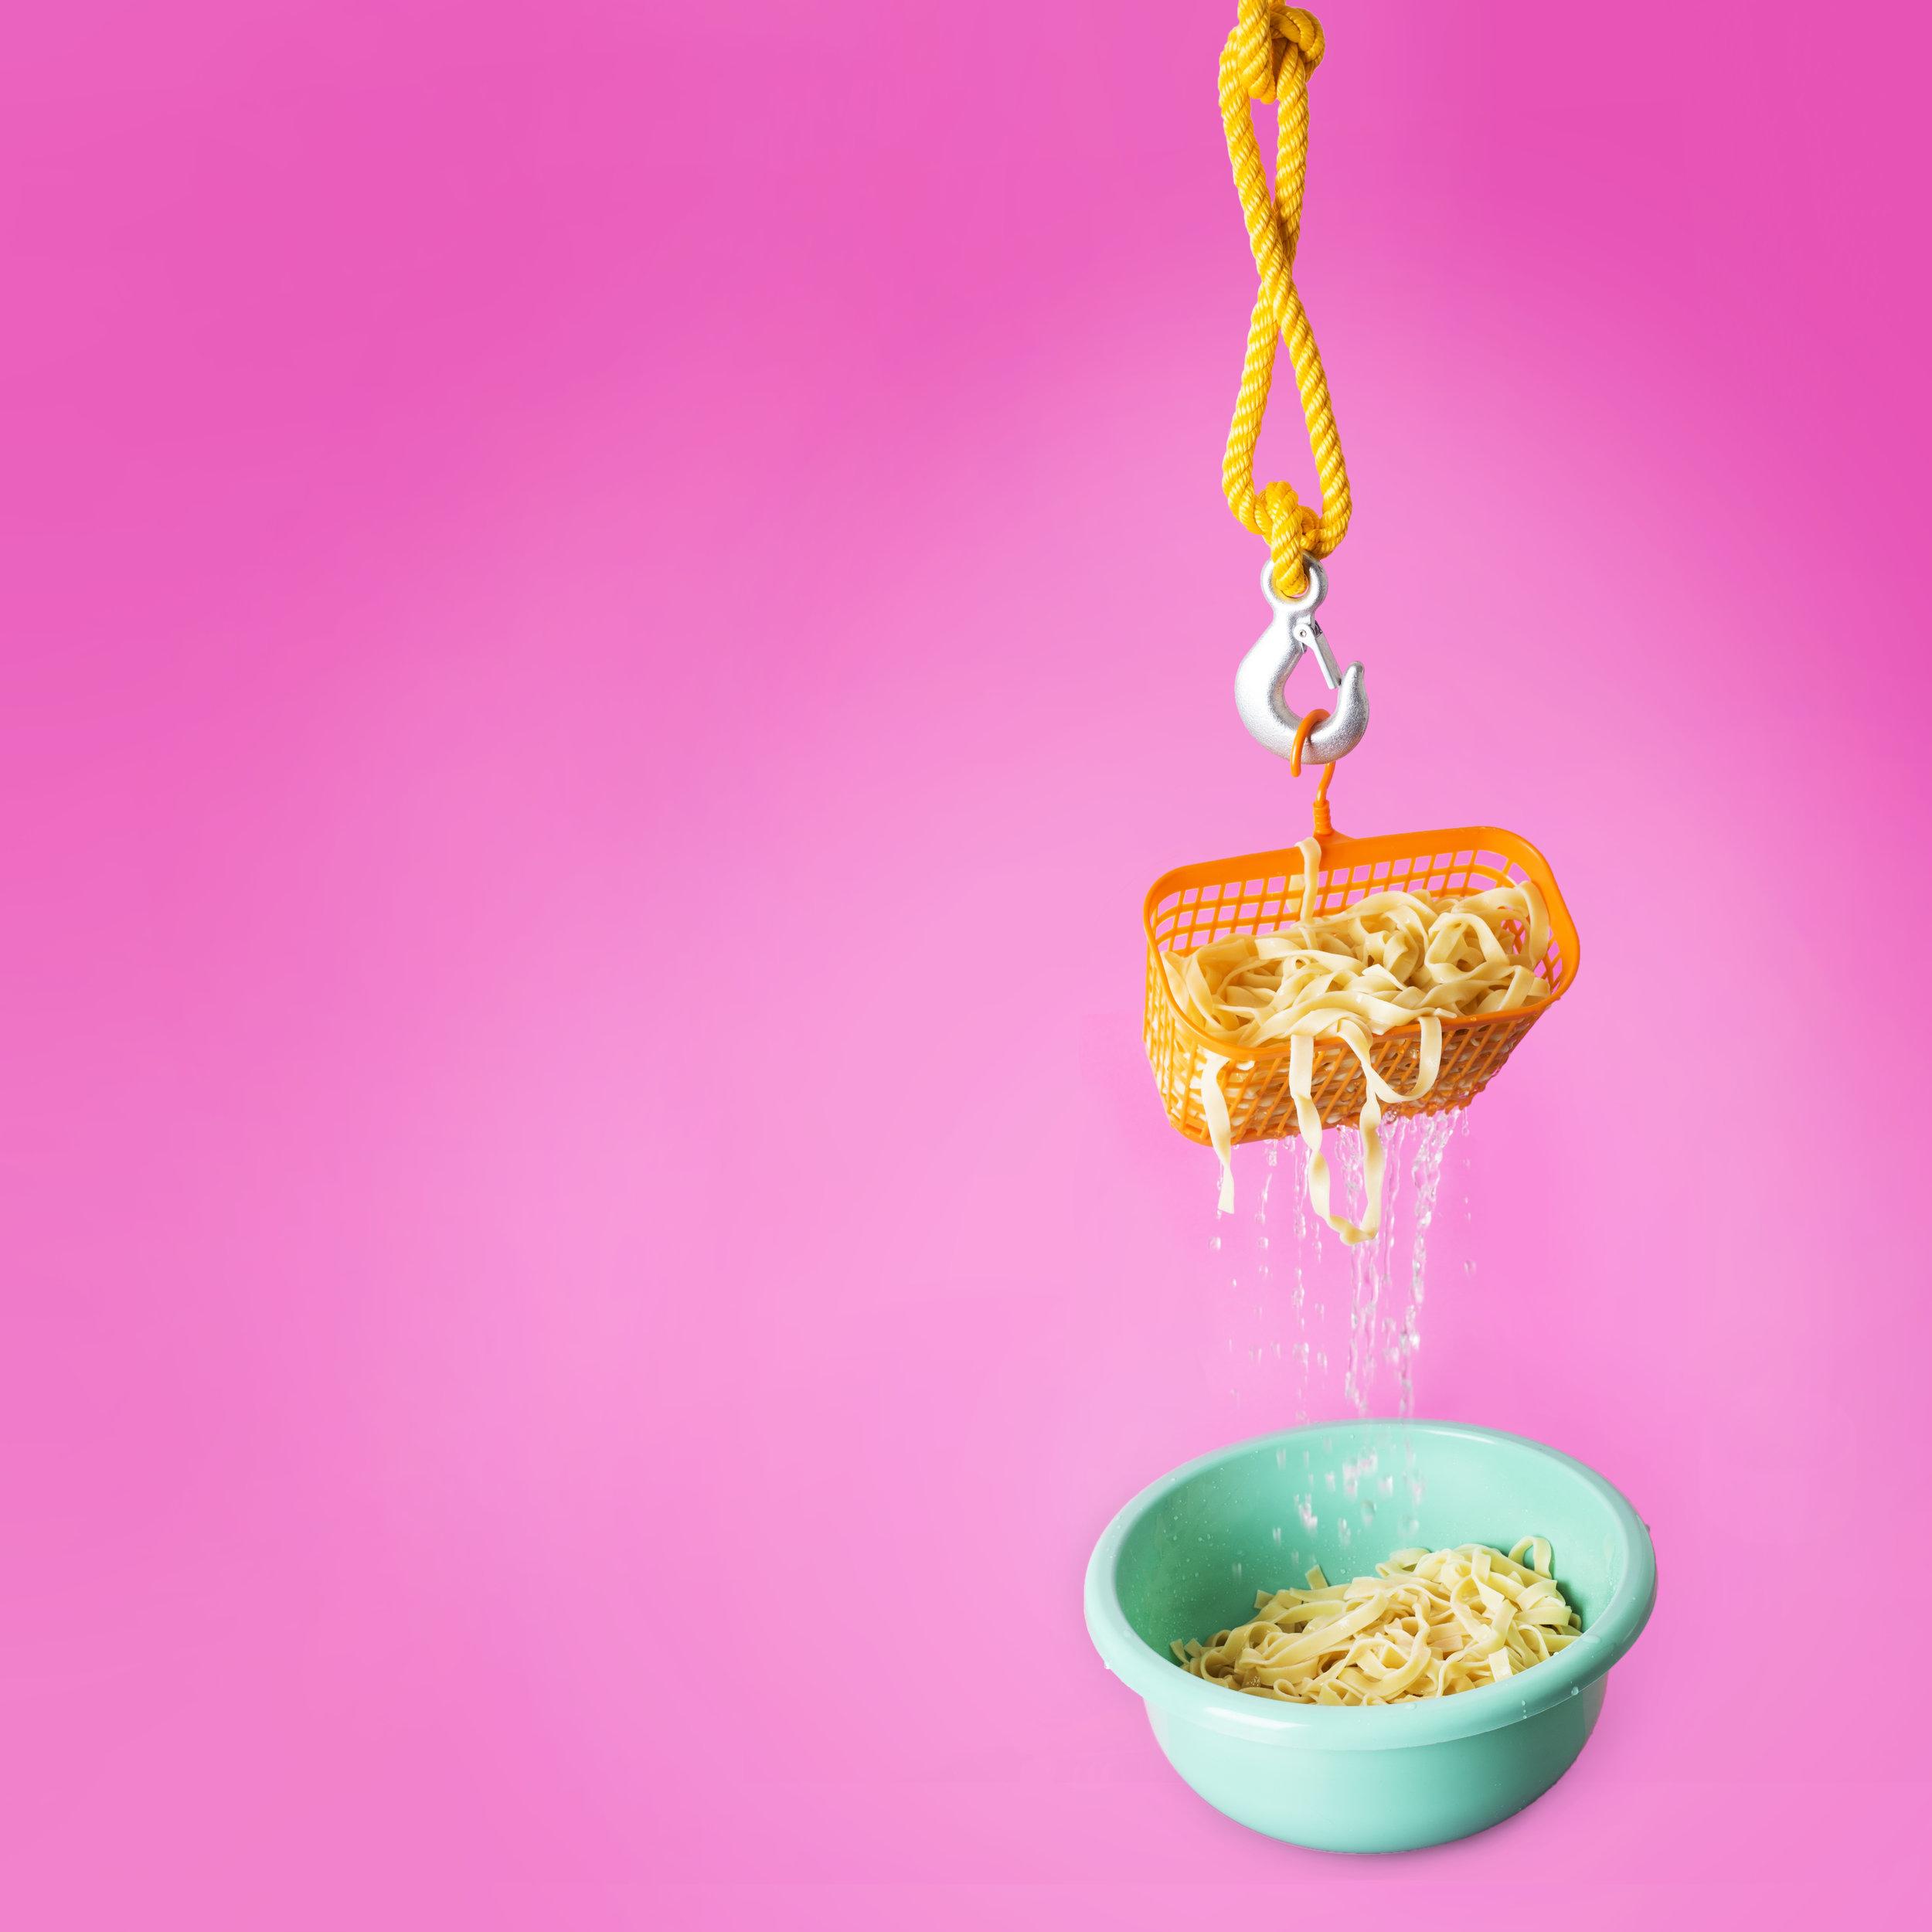 February 7th - Fettuccini Alfredo Day